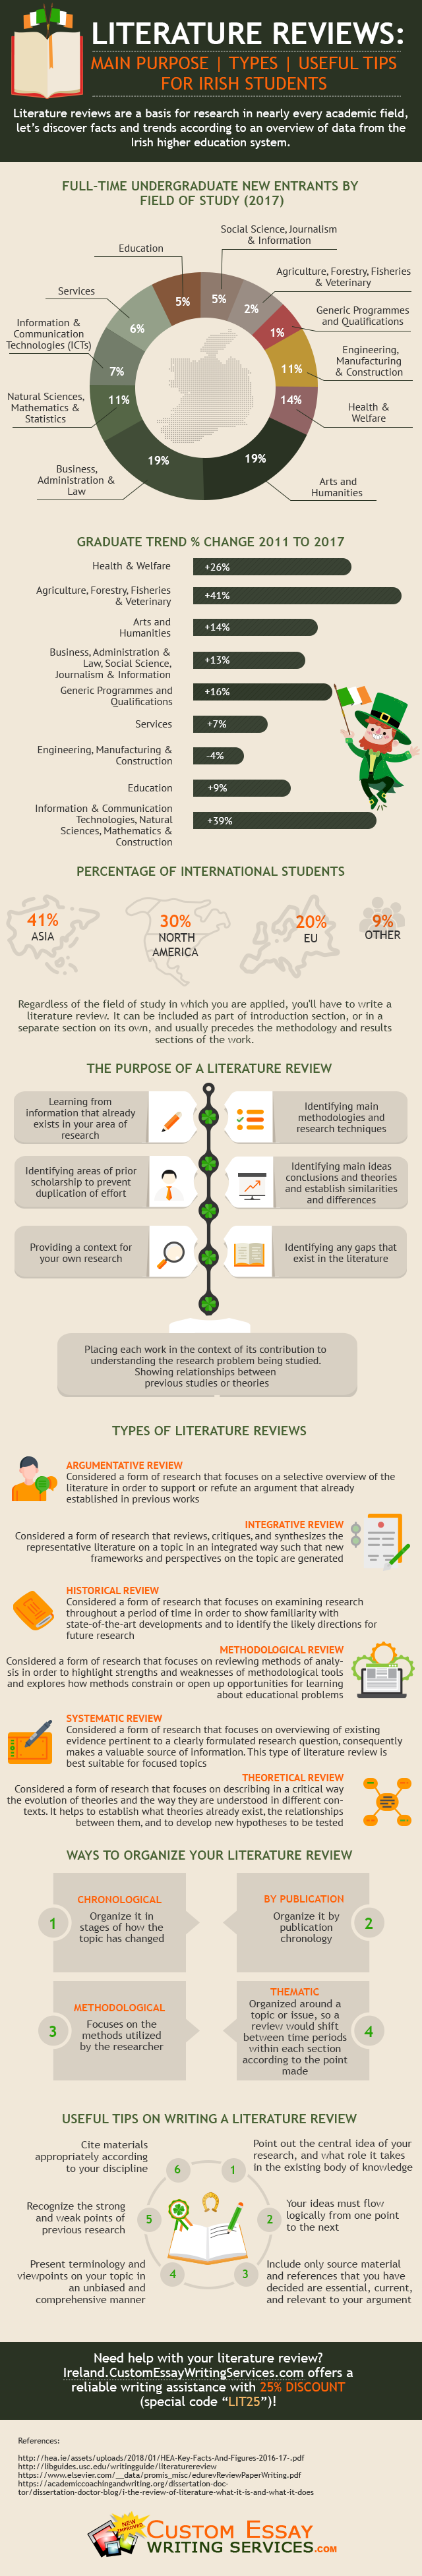 How do I write a review of Irish literature? #infographic